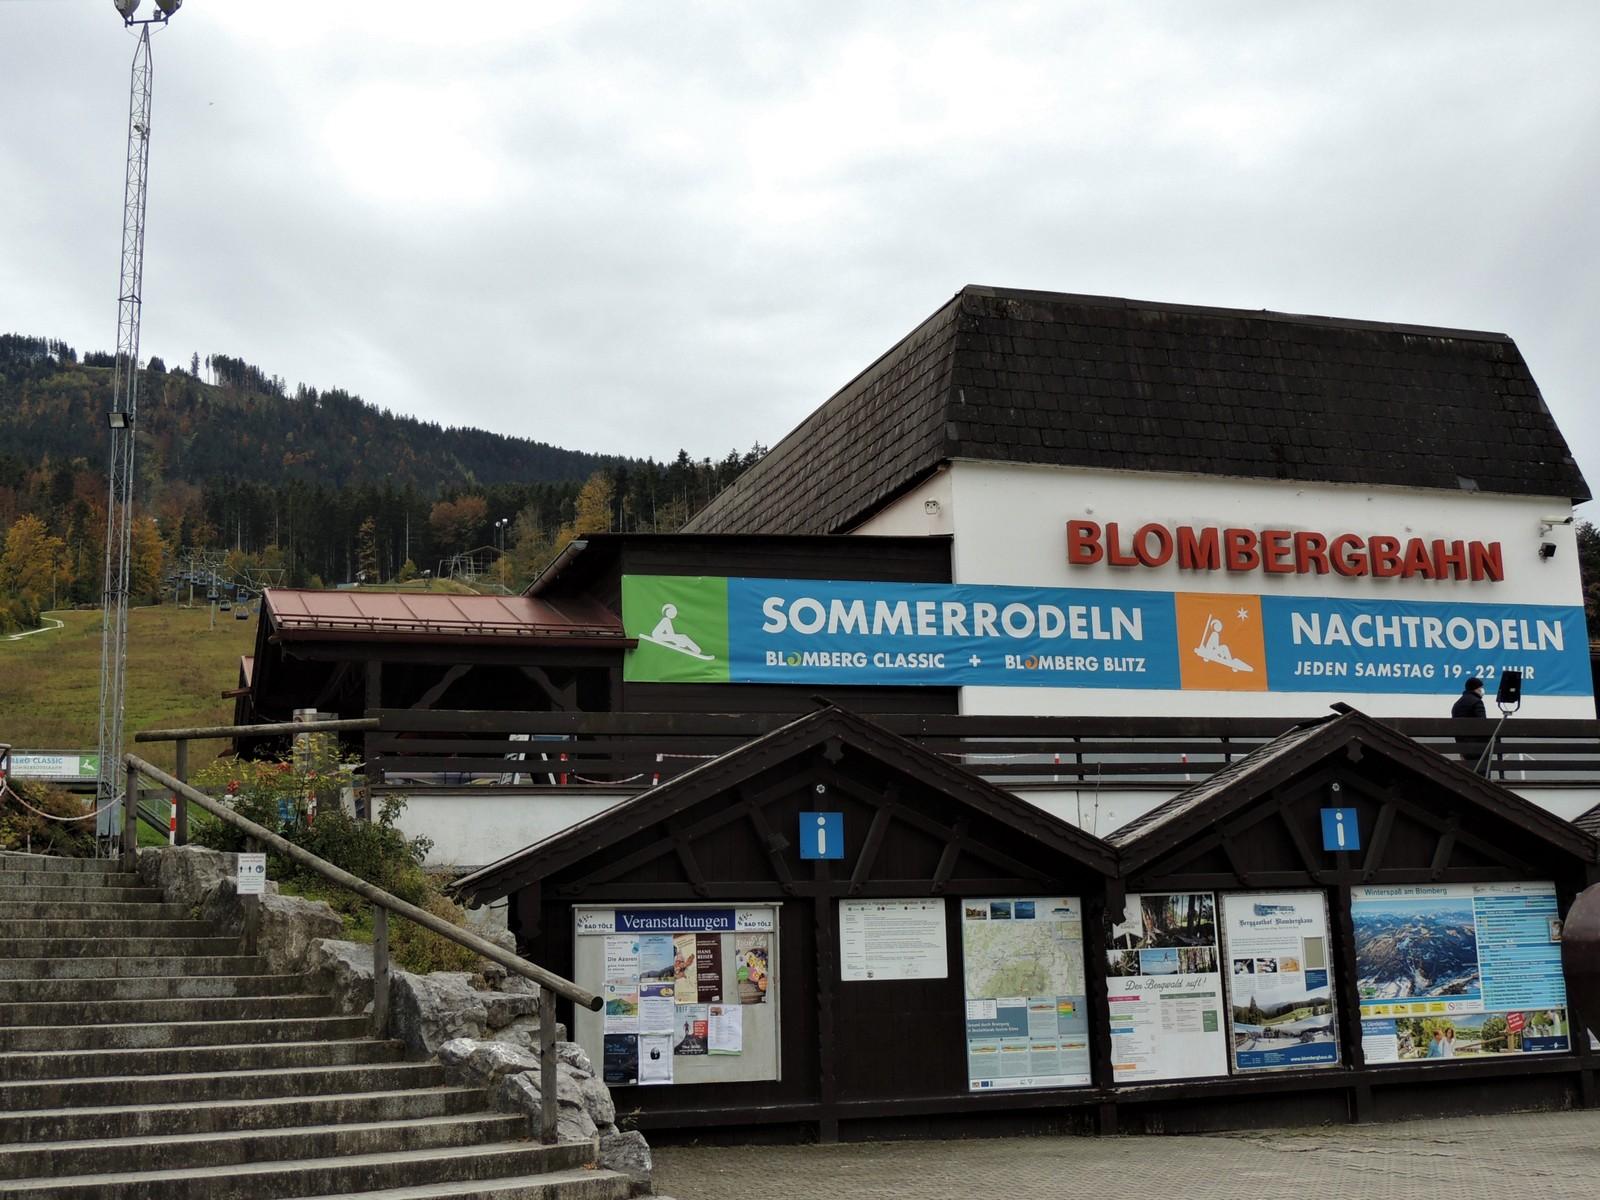 Blombergbahn im Tölzer Land